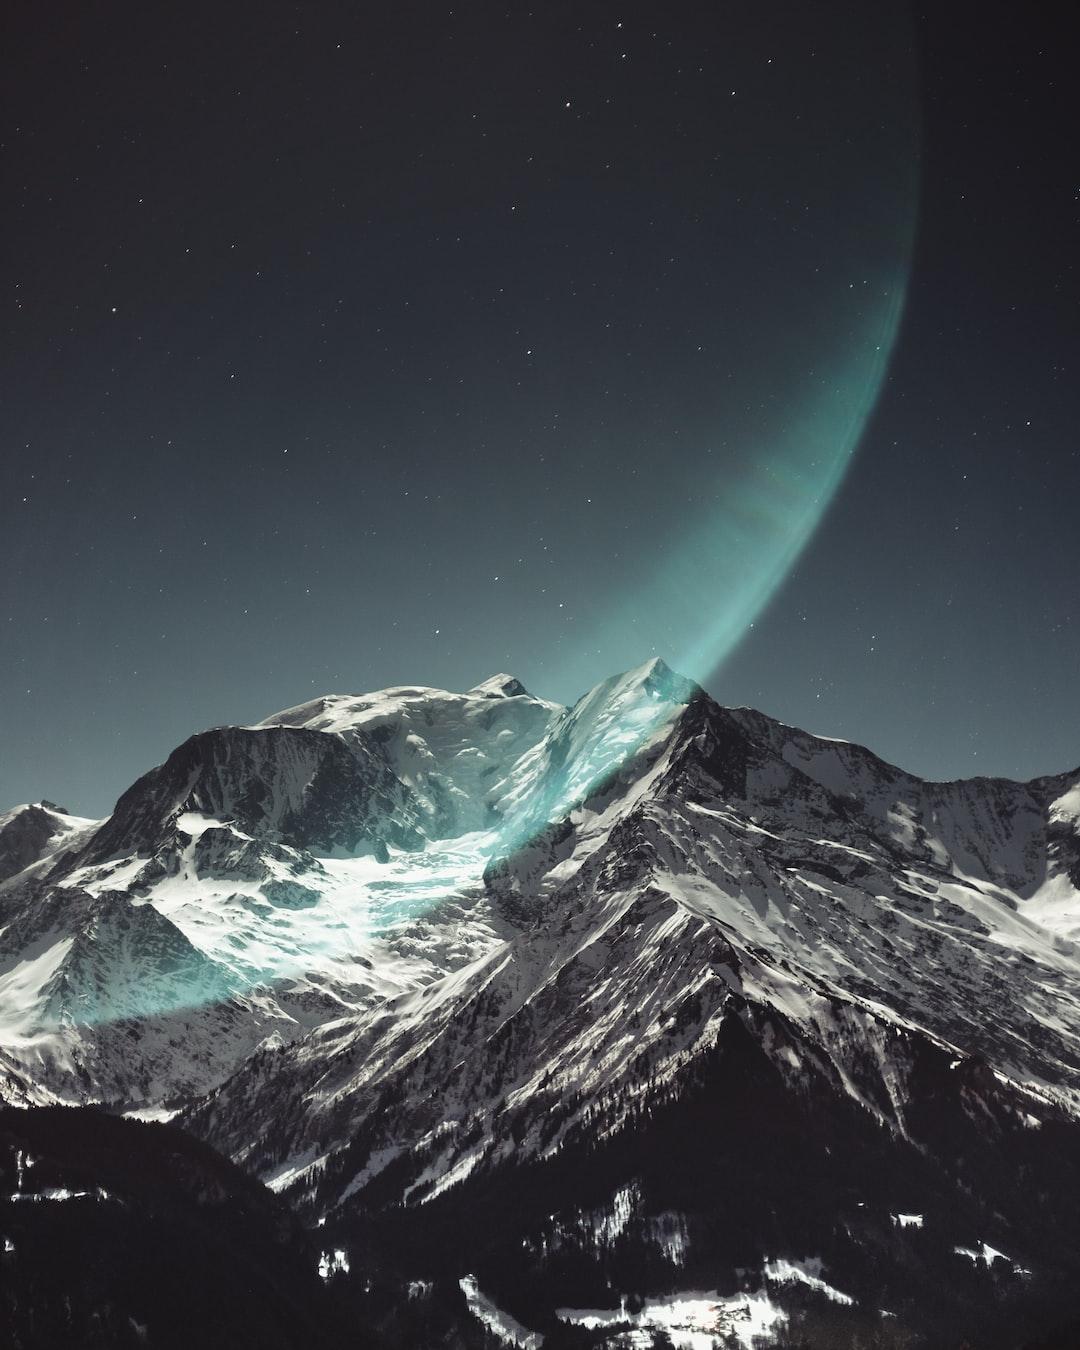 My mountain. Please go like this pic on my Instagram : https://www.instagram.com/p/BuRDU7qhtIz/?utm_source=ig_share_sheet&igshid=4gpg5siyx43h